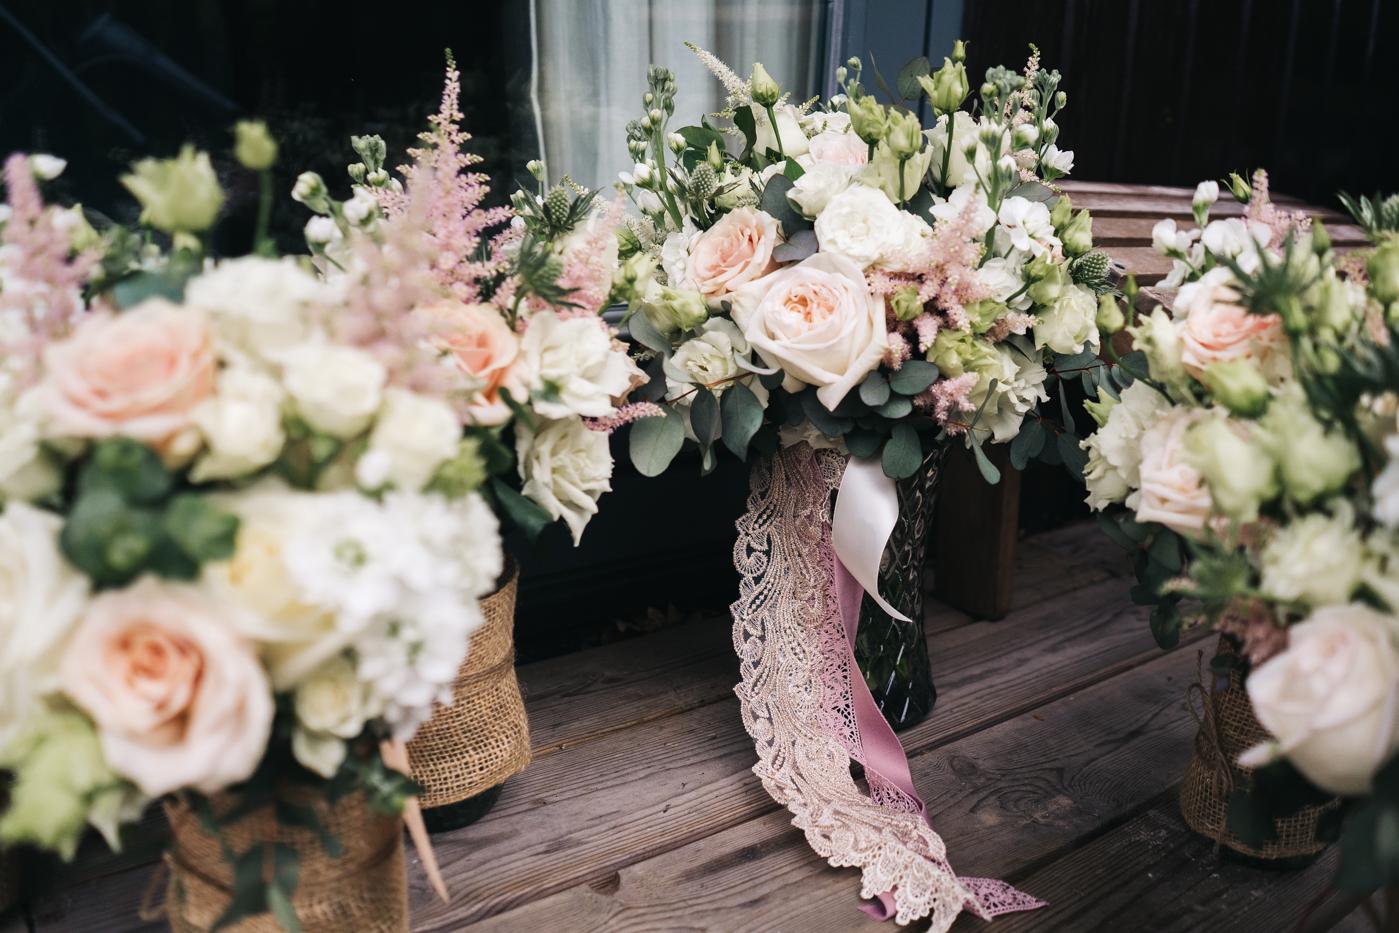 scottish-wedding-trossachs-loch-tay-highlannds-relaxed-photography-photographer-0001.jpg